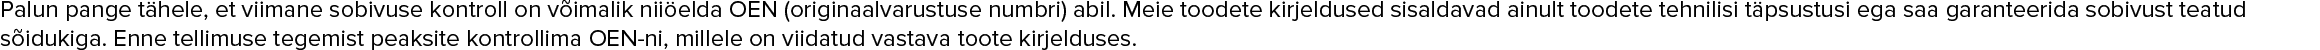 ELRING 021 109 349 A, 021.109.349.A, 021 109 349 A, 021 109 349 A, 021 109 349 A Tihend, tõukur